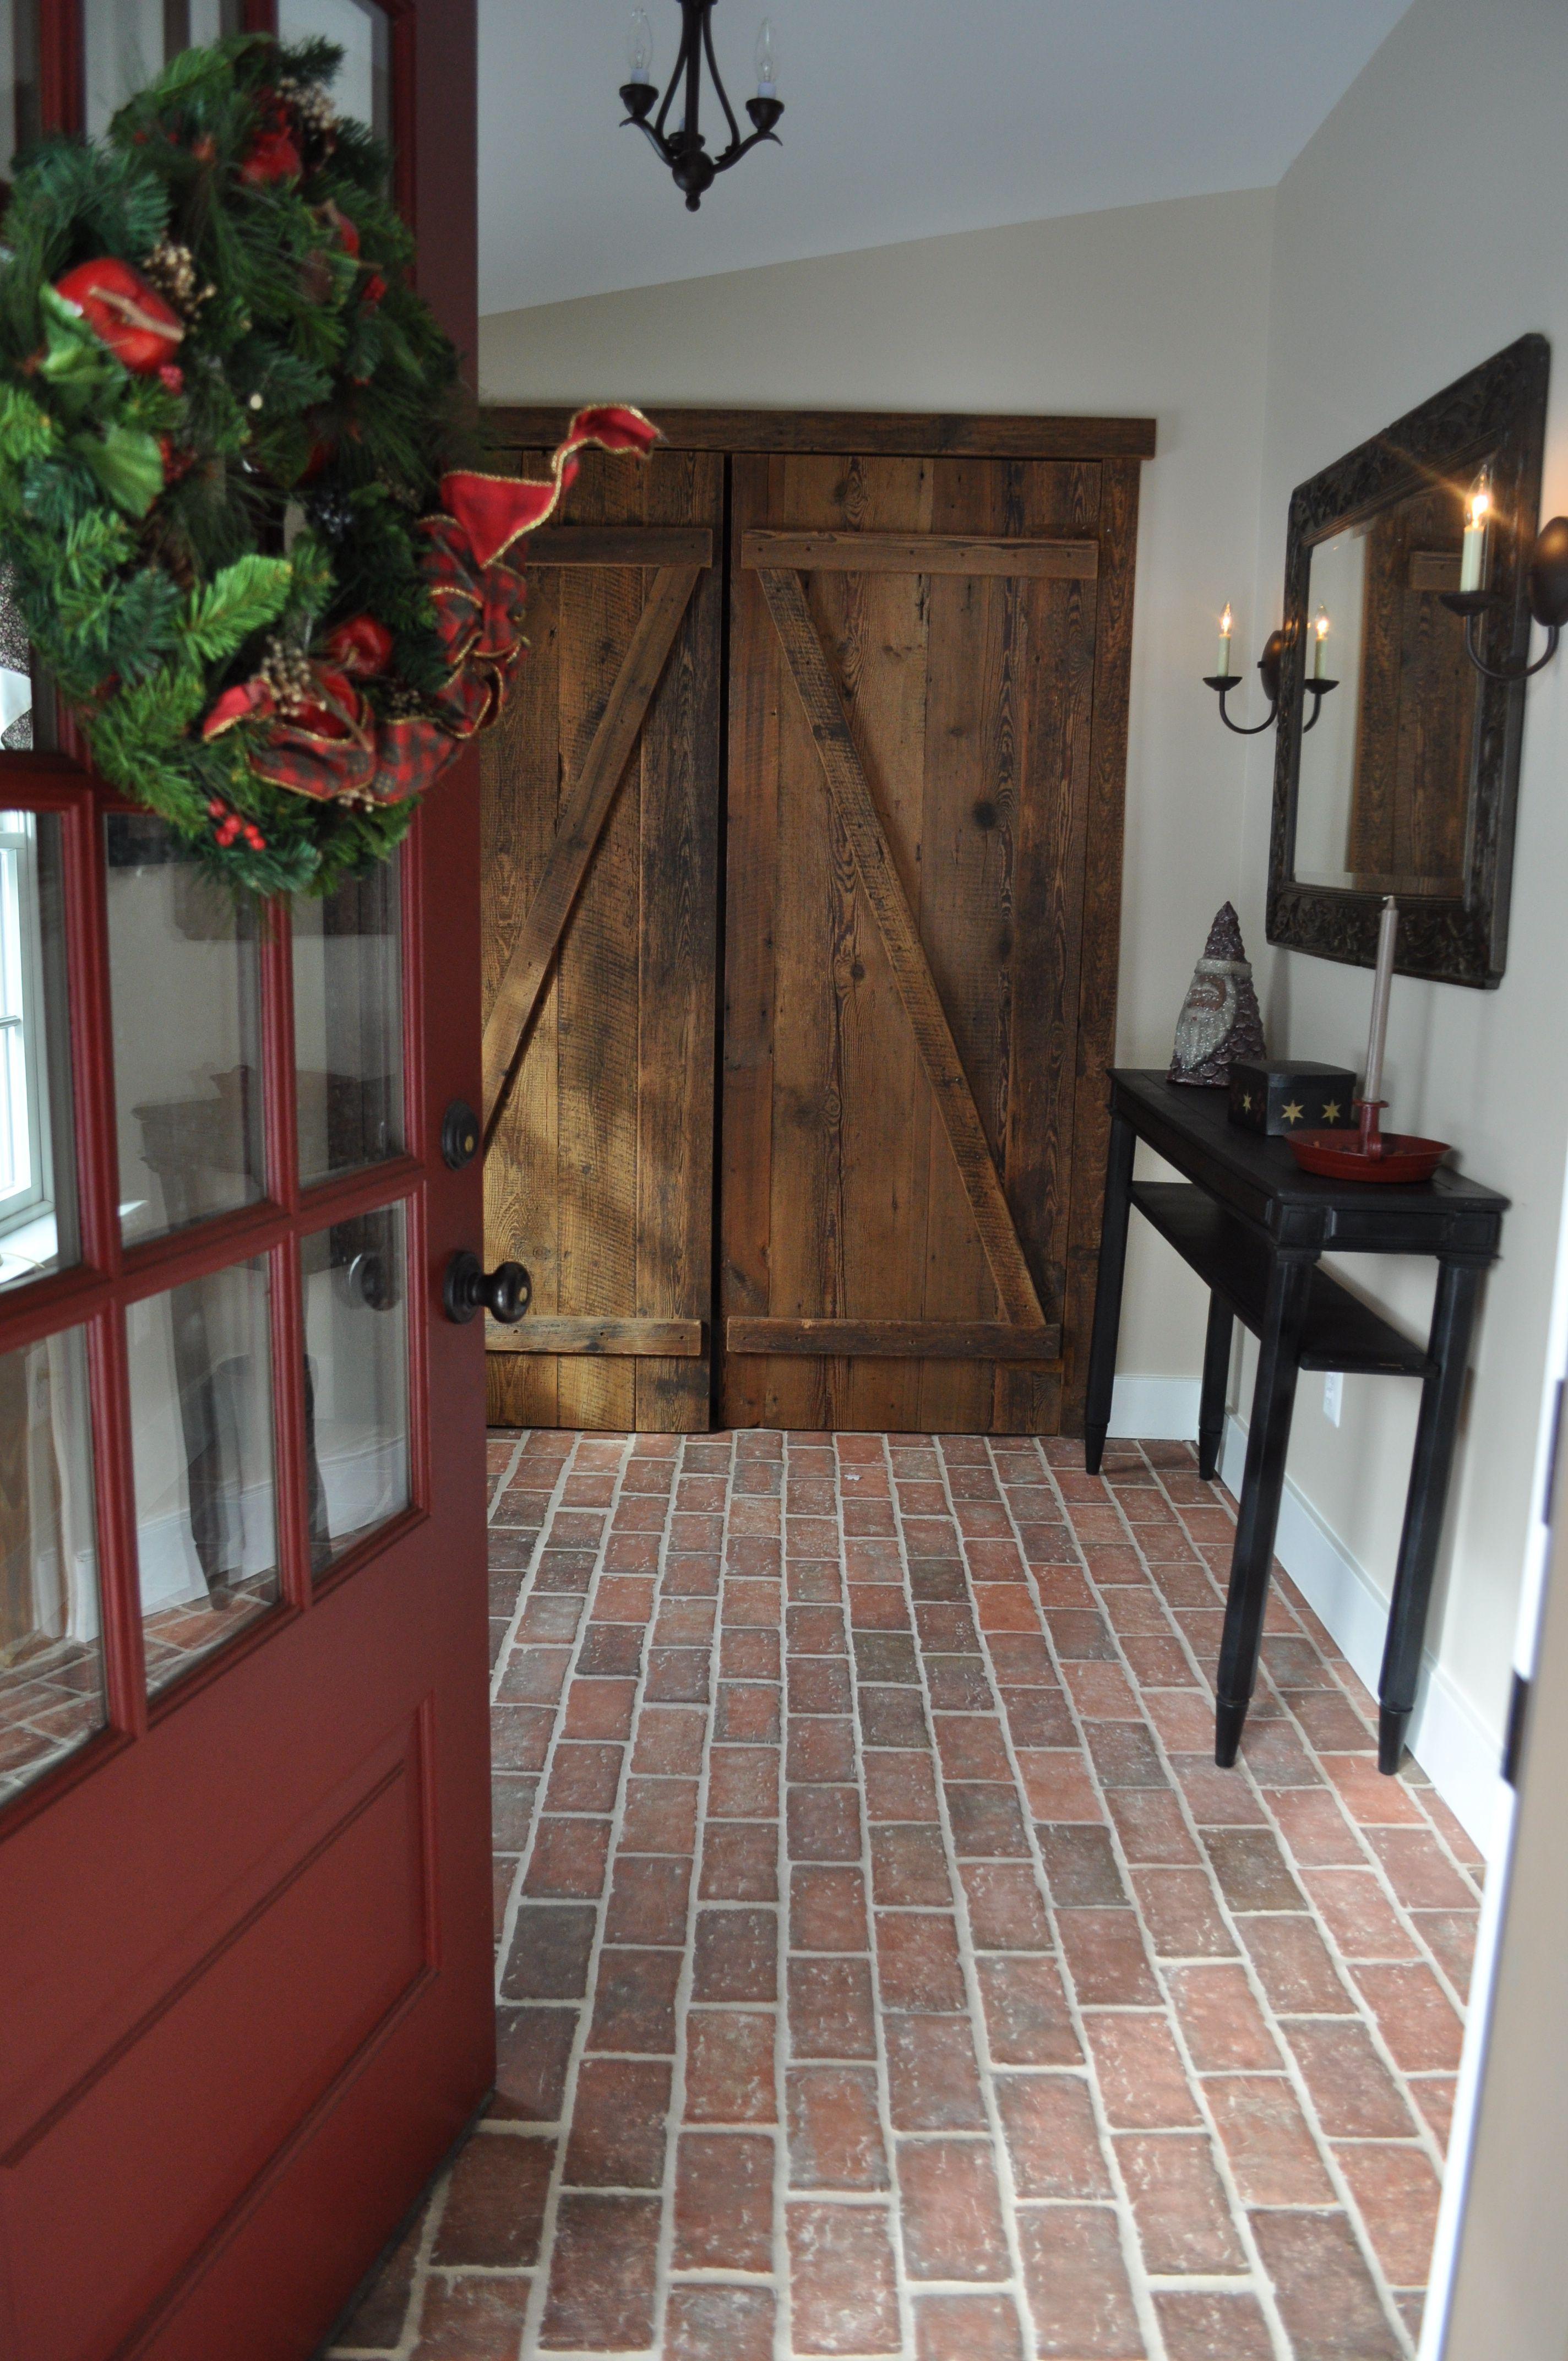 tumbled brick entryway - Google Search   Dream Home   Pinterest ...